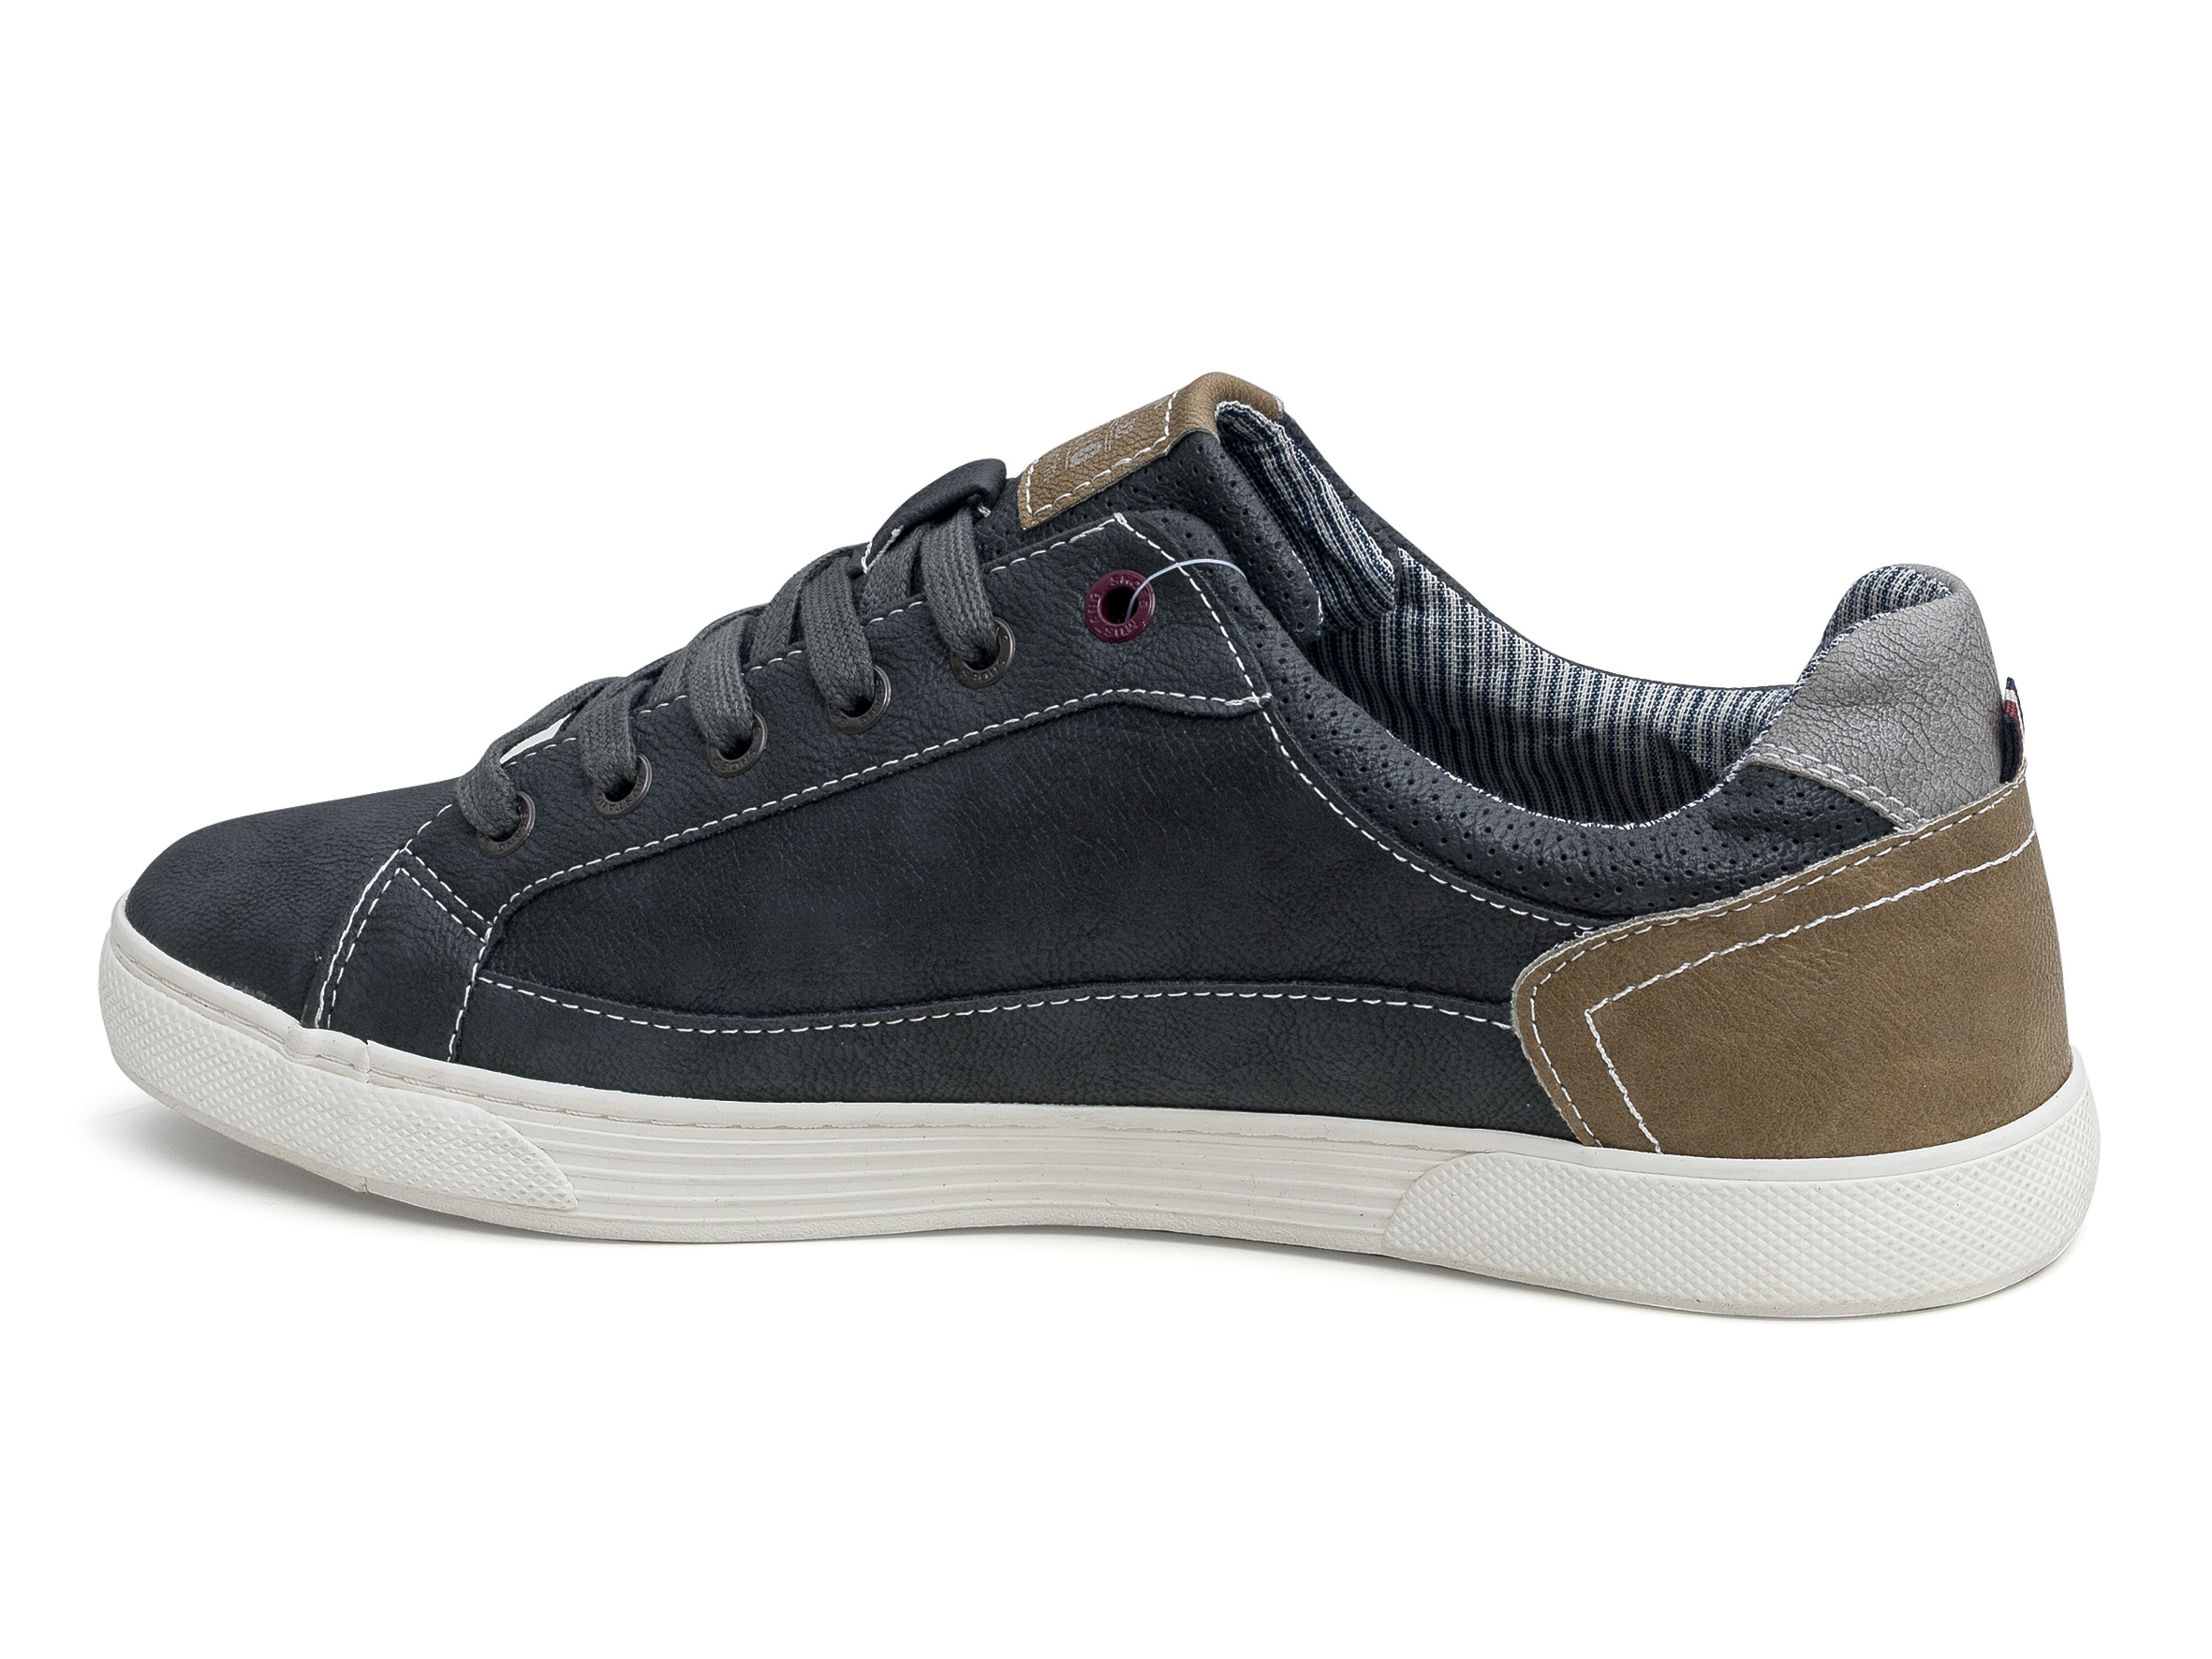 ... Mustang boty shoes buty schuhe topánky chaussure cipő čevlje schoenen  scarpe zapatos batai pantofi sko skor ... bcbf4b1619